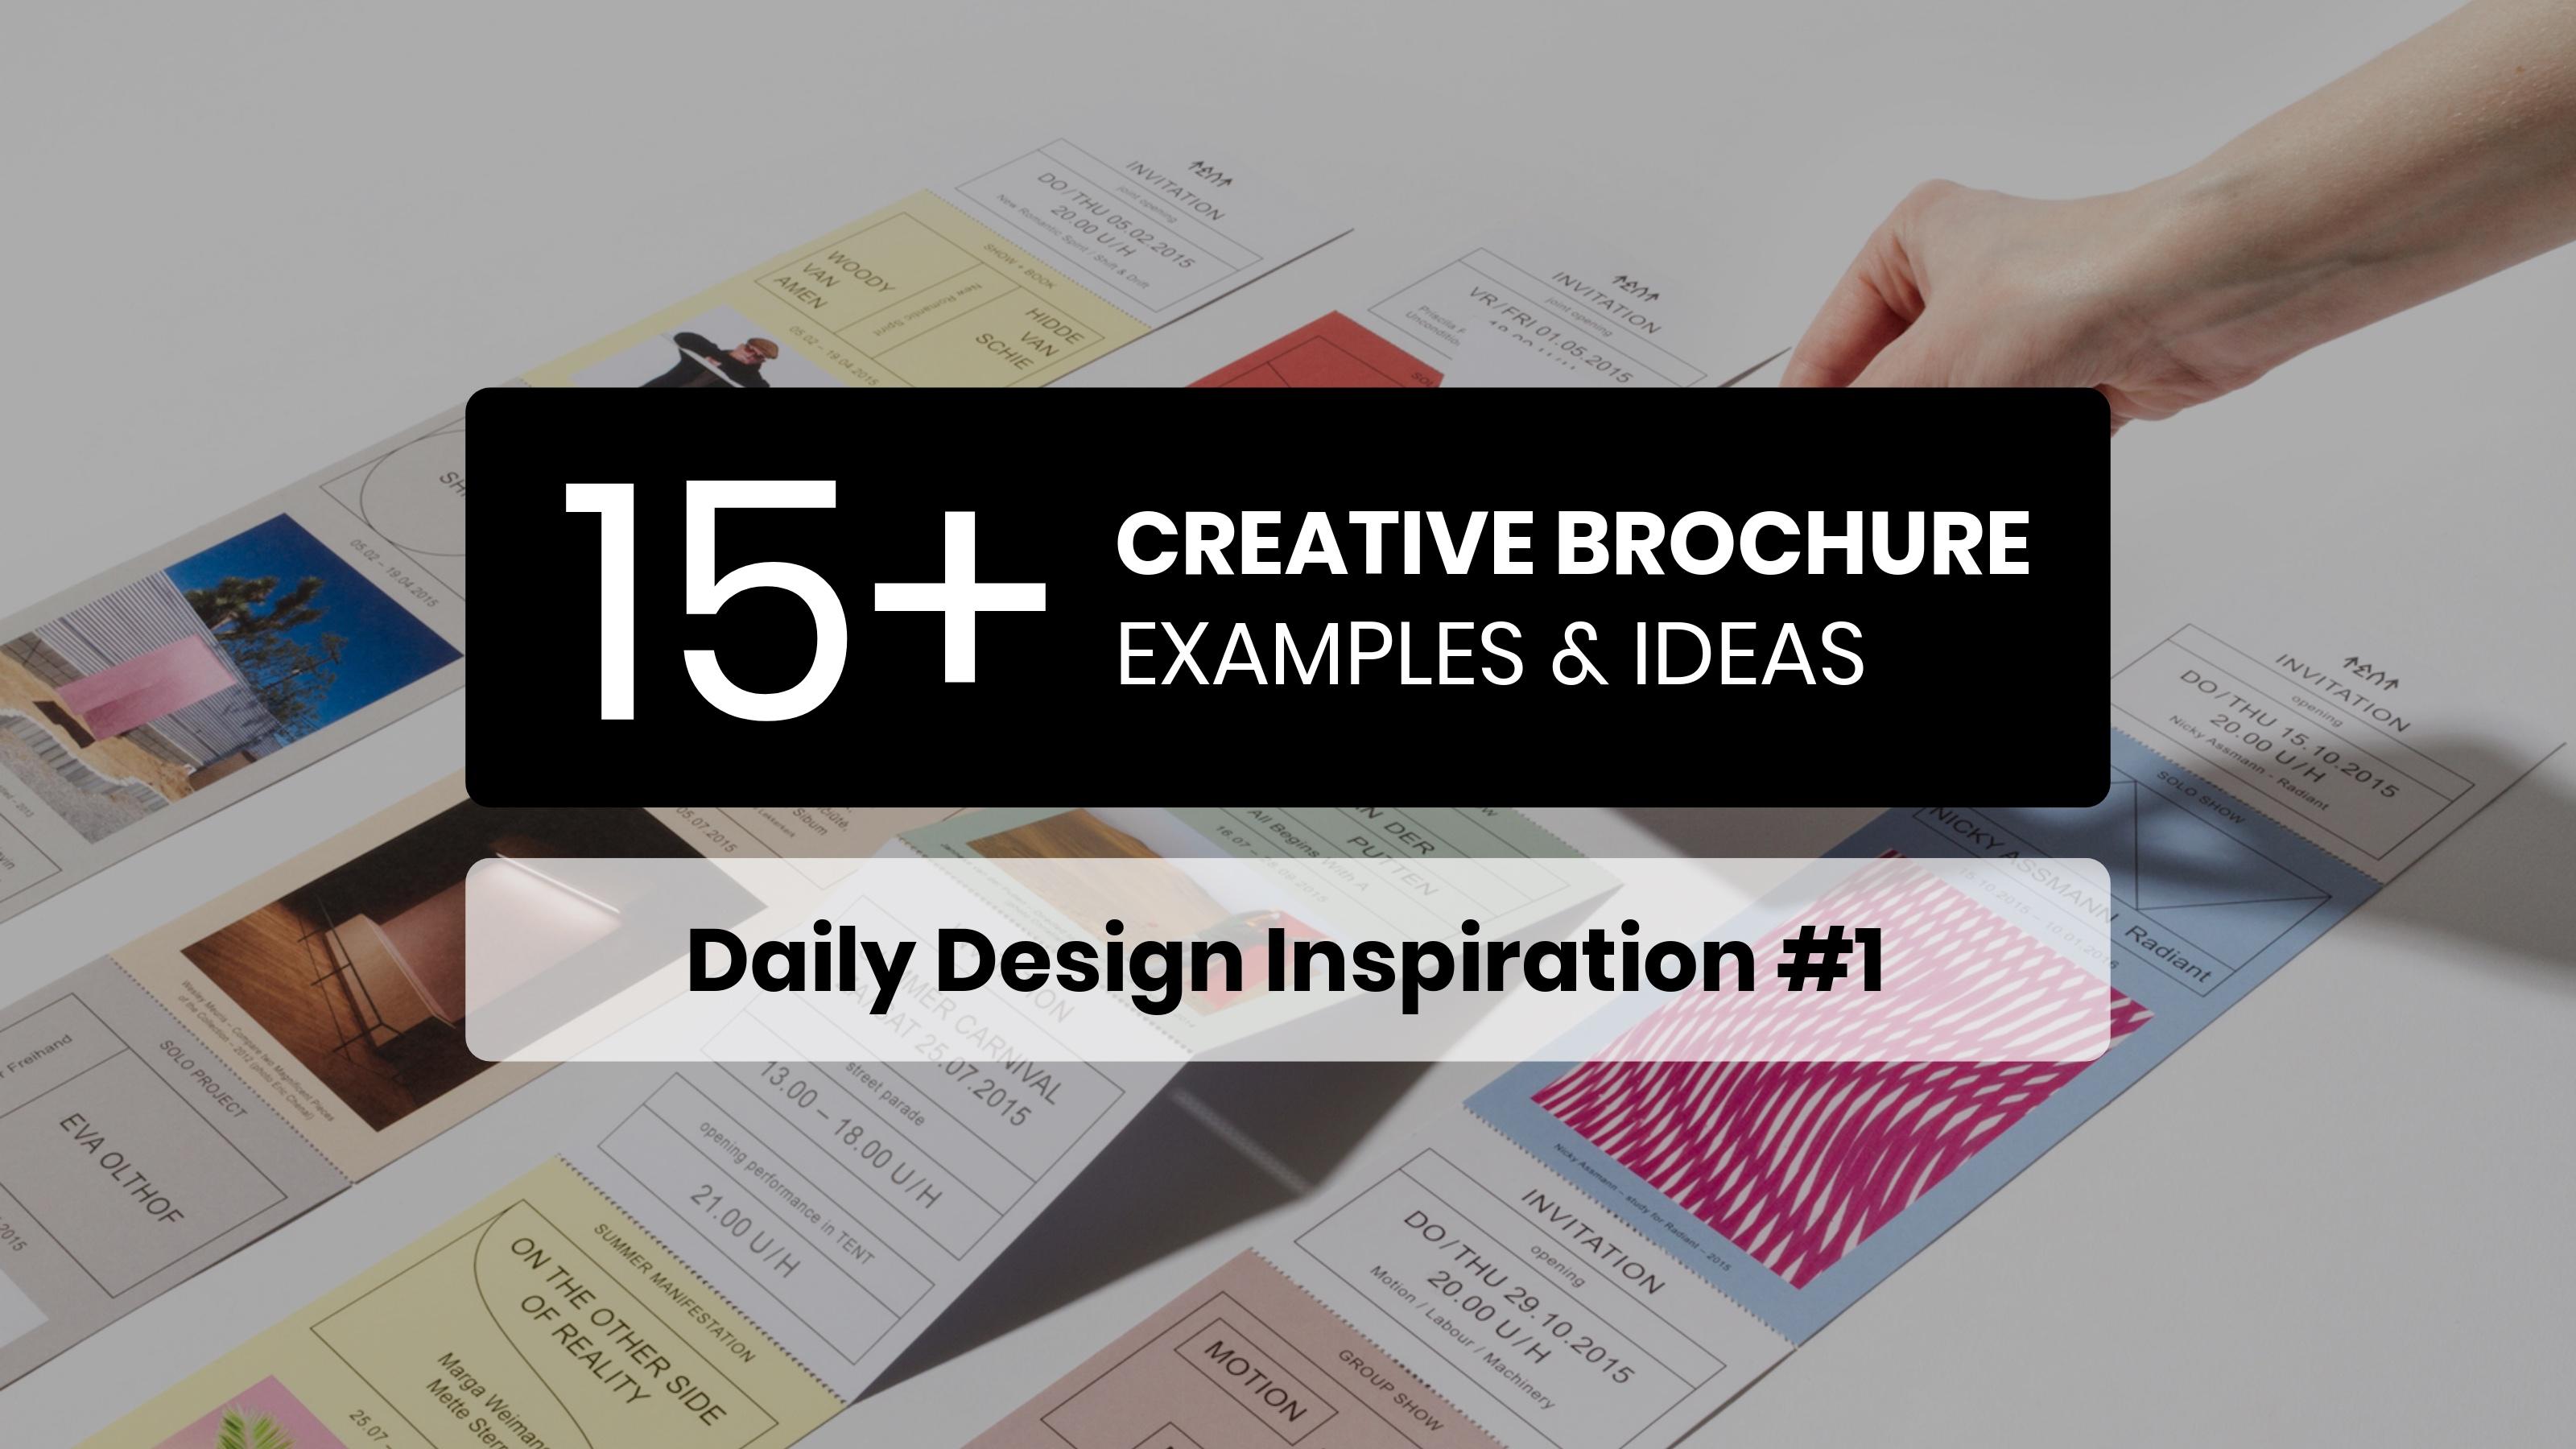 15 creative brochure examples ideas daily design inspiration 1